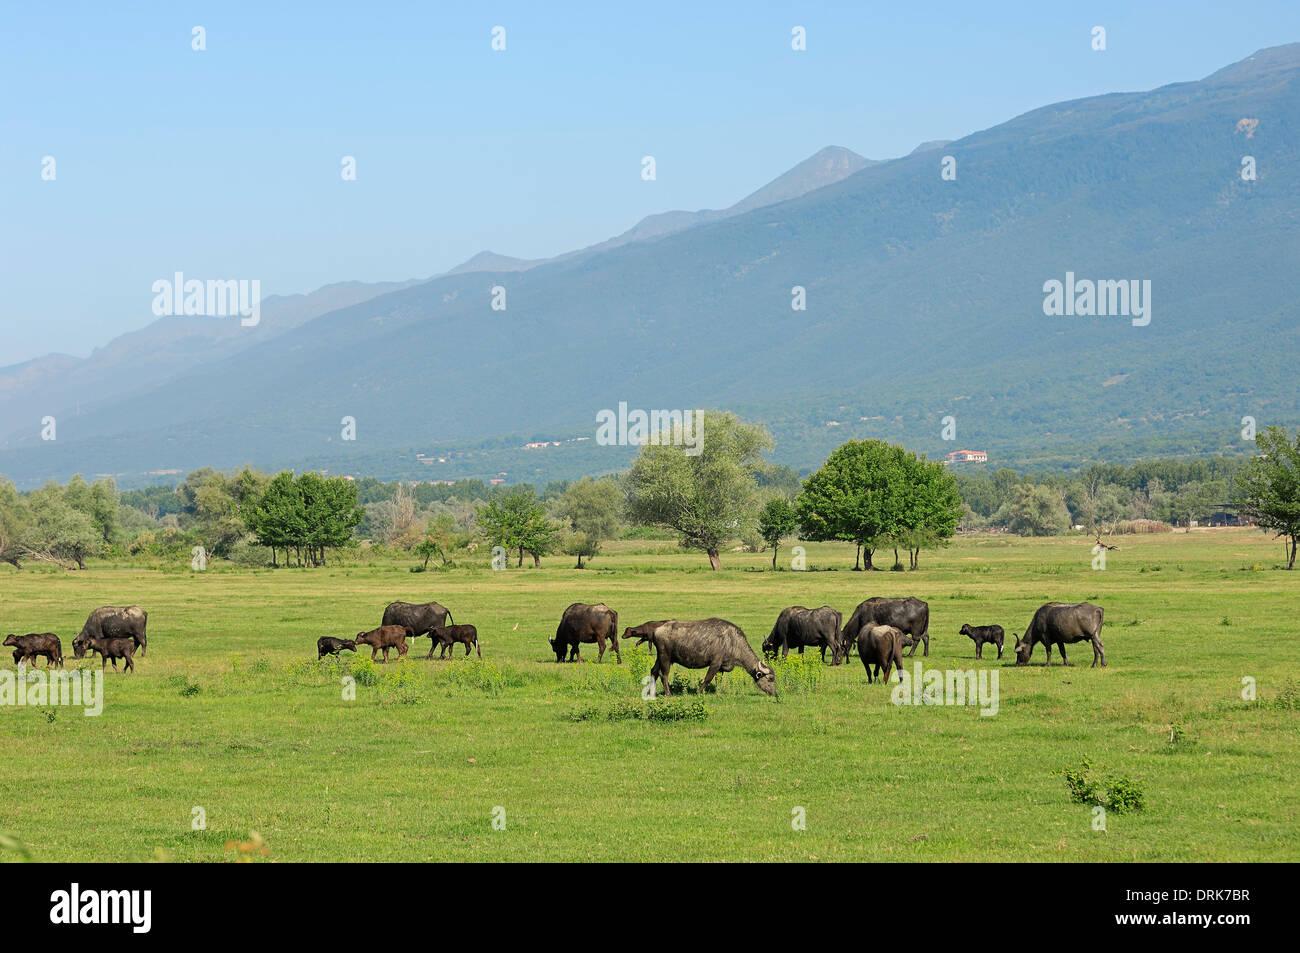 Asian Water Buffalo or Carabao (Bos arnee, Bubalus arnee), group on pasture, Greece, Europe - Stock Image